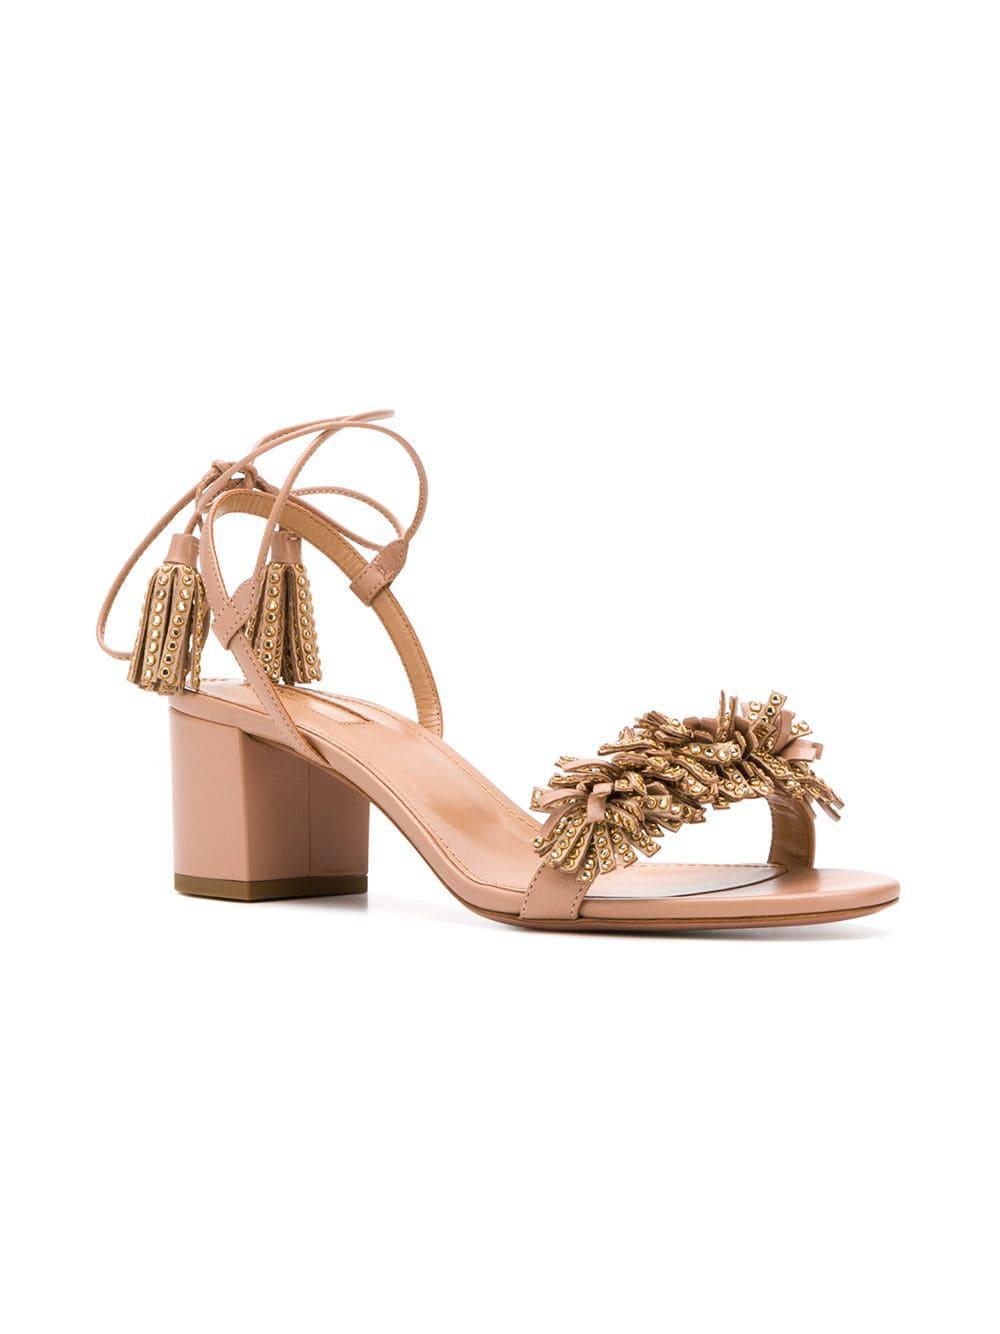 8a9f913a3 Lyst - Aquazzura Wild Crystal Sandals in Pink